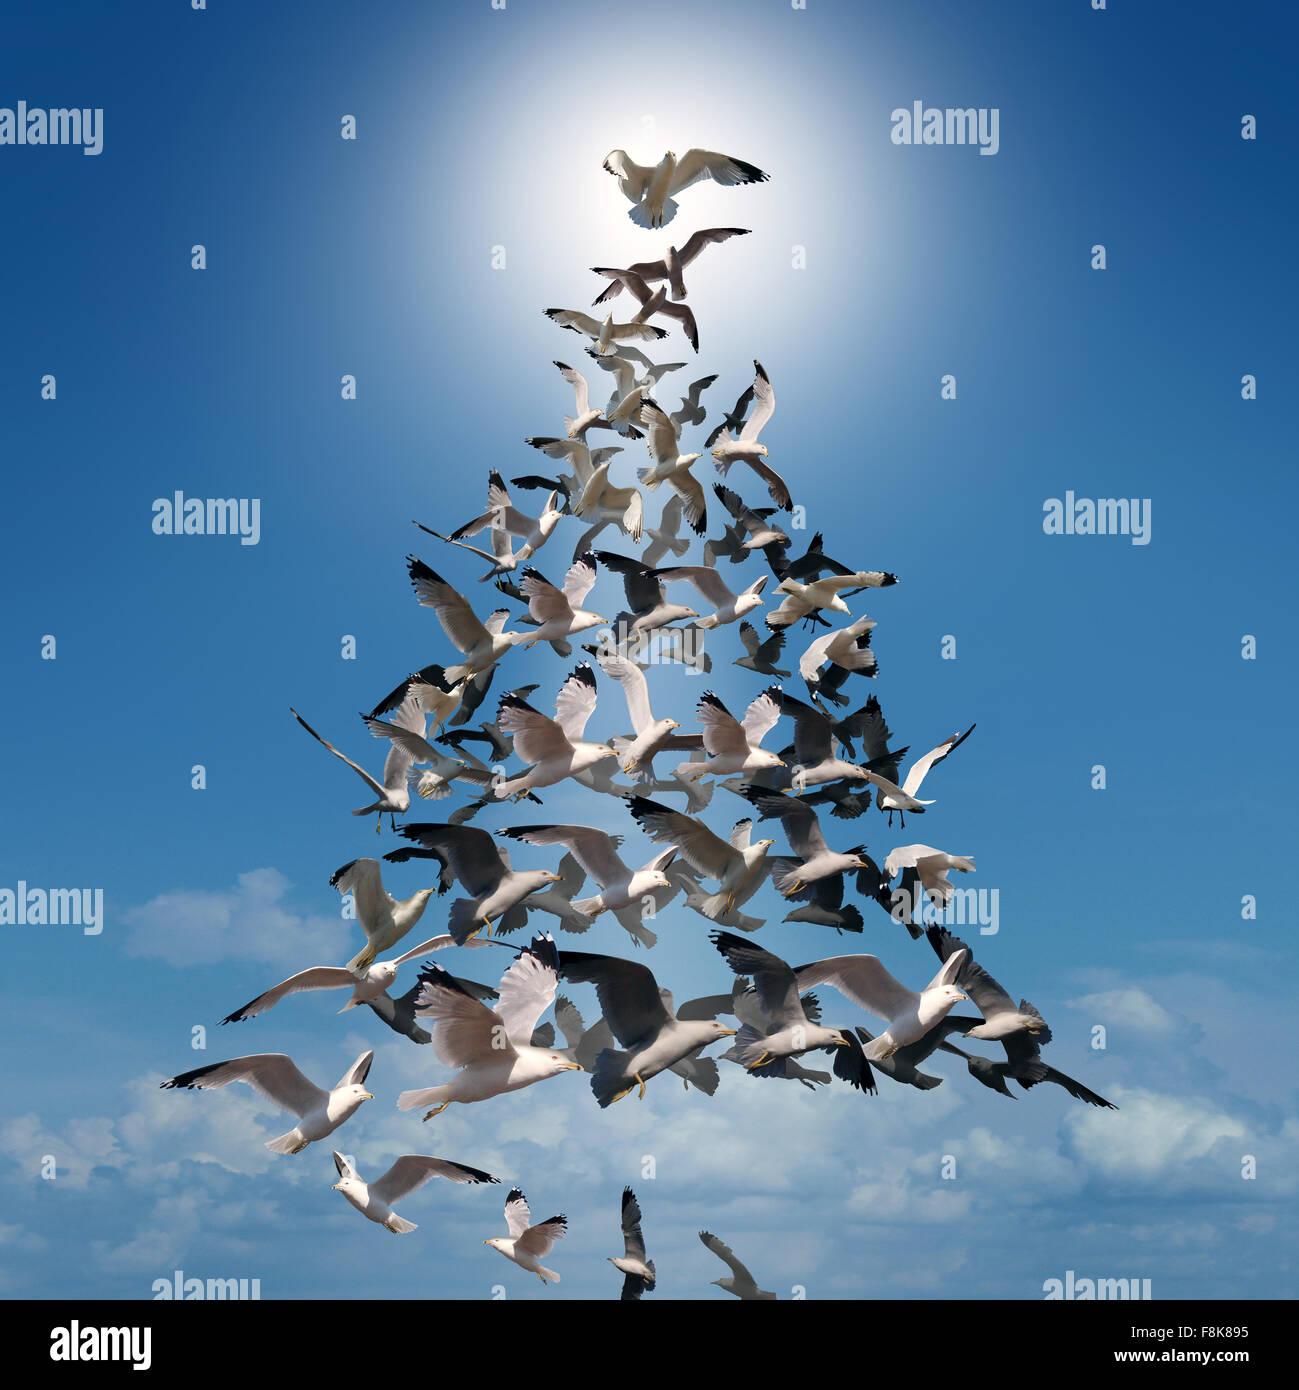 Árbol de Navidad de esperanza concepto espiritual como un grupo de aves volando en estilo coordinado en forma Imagen De Stock